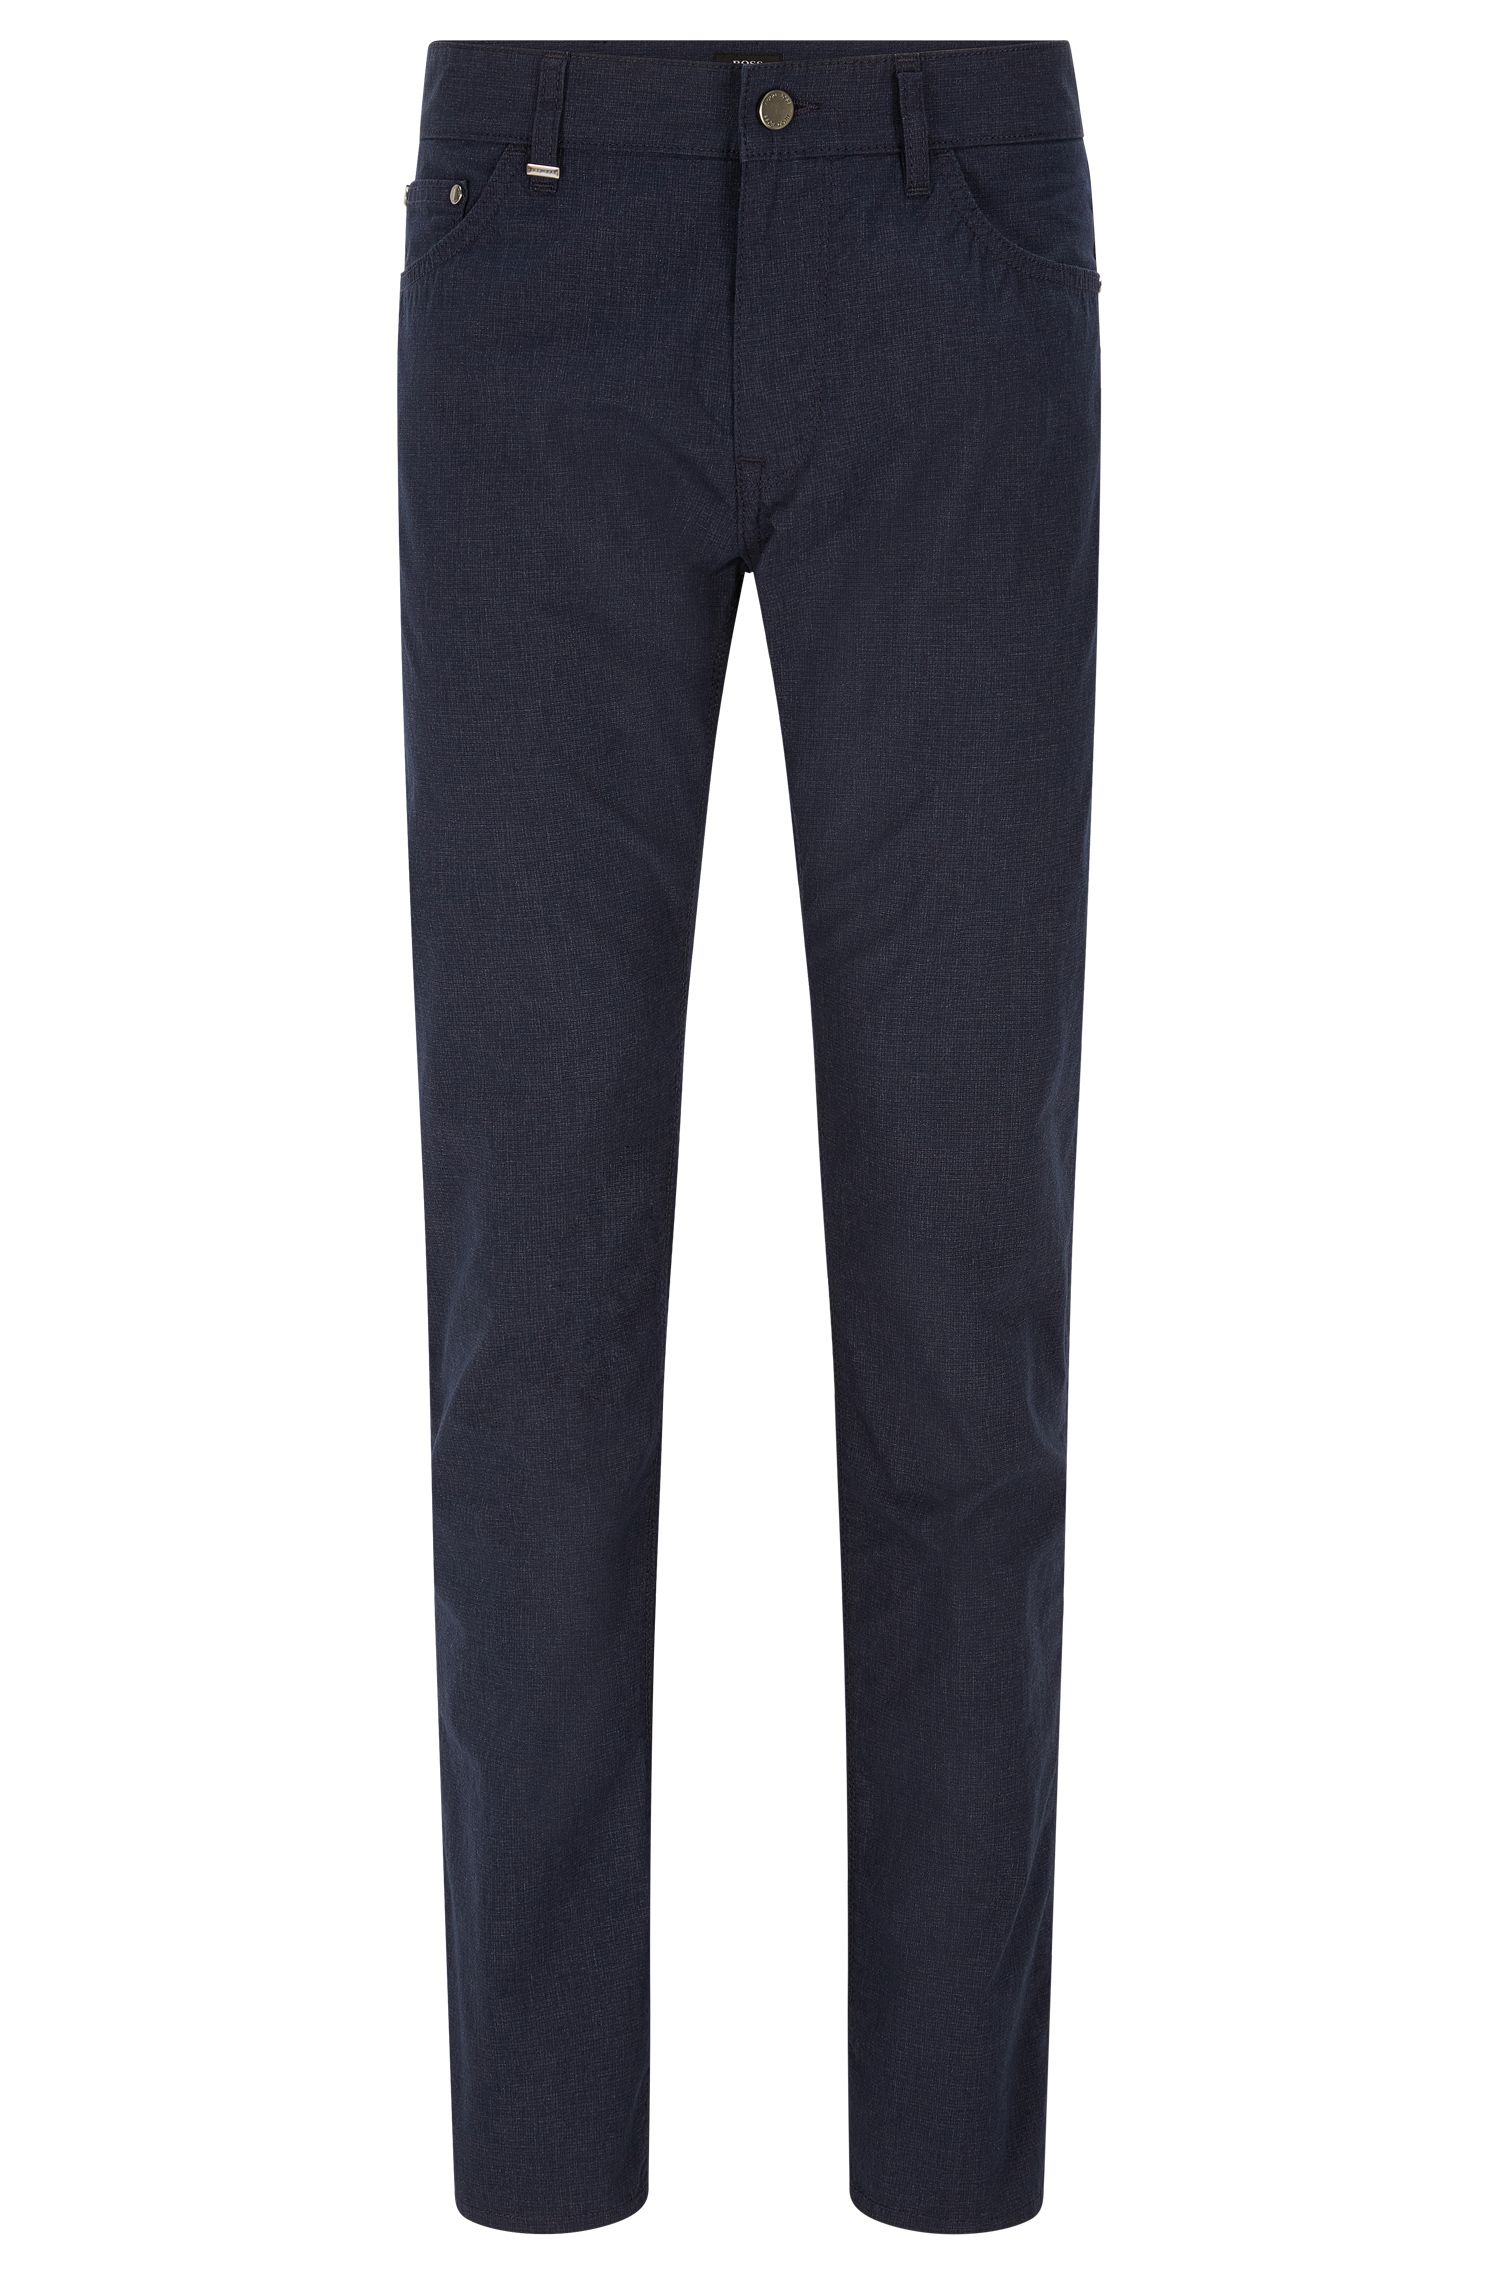 9 oz Basketweave Stretch Cotton Pant, Regular Fit | Maine